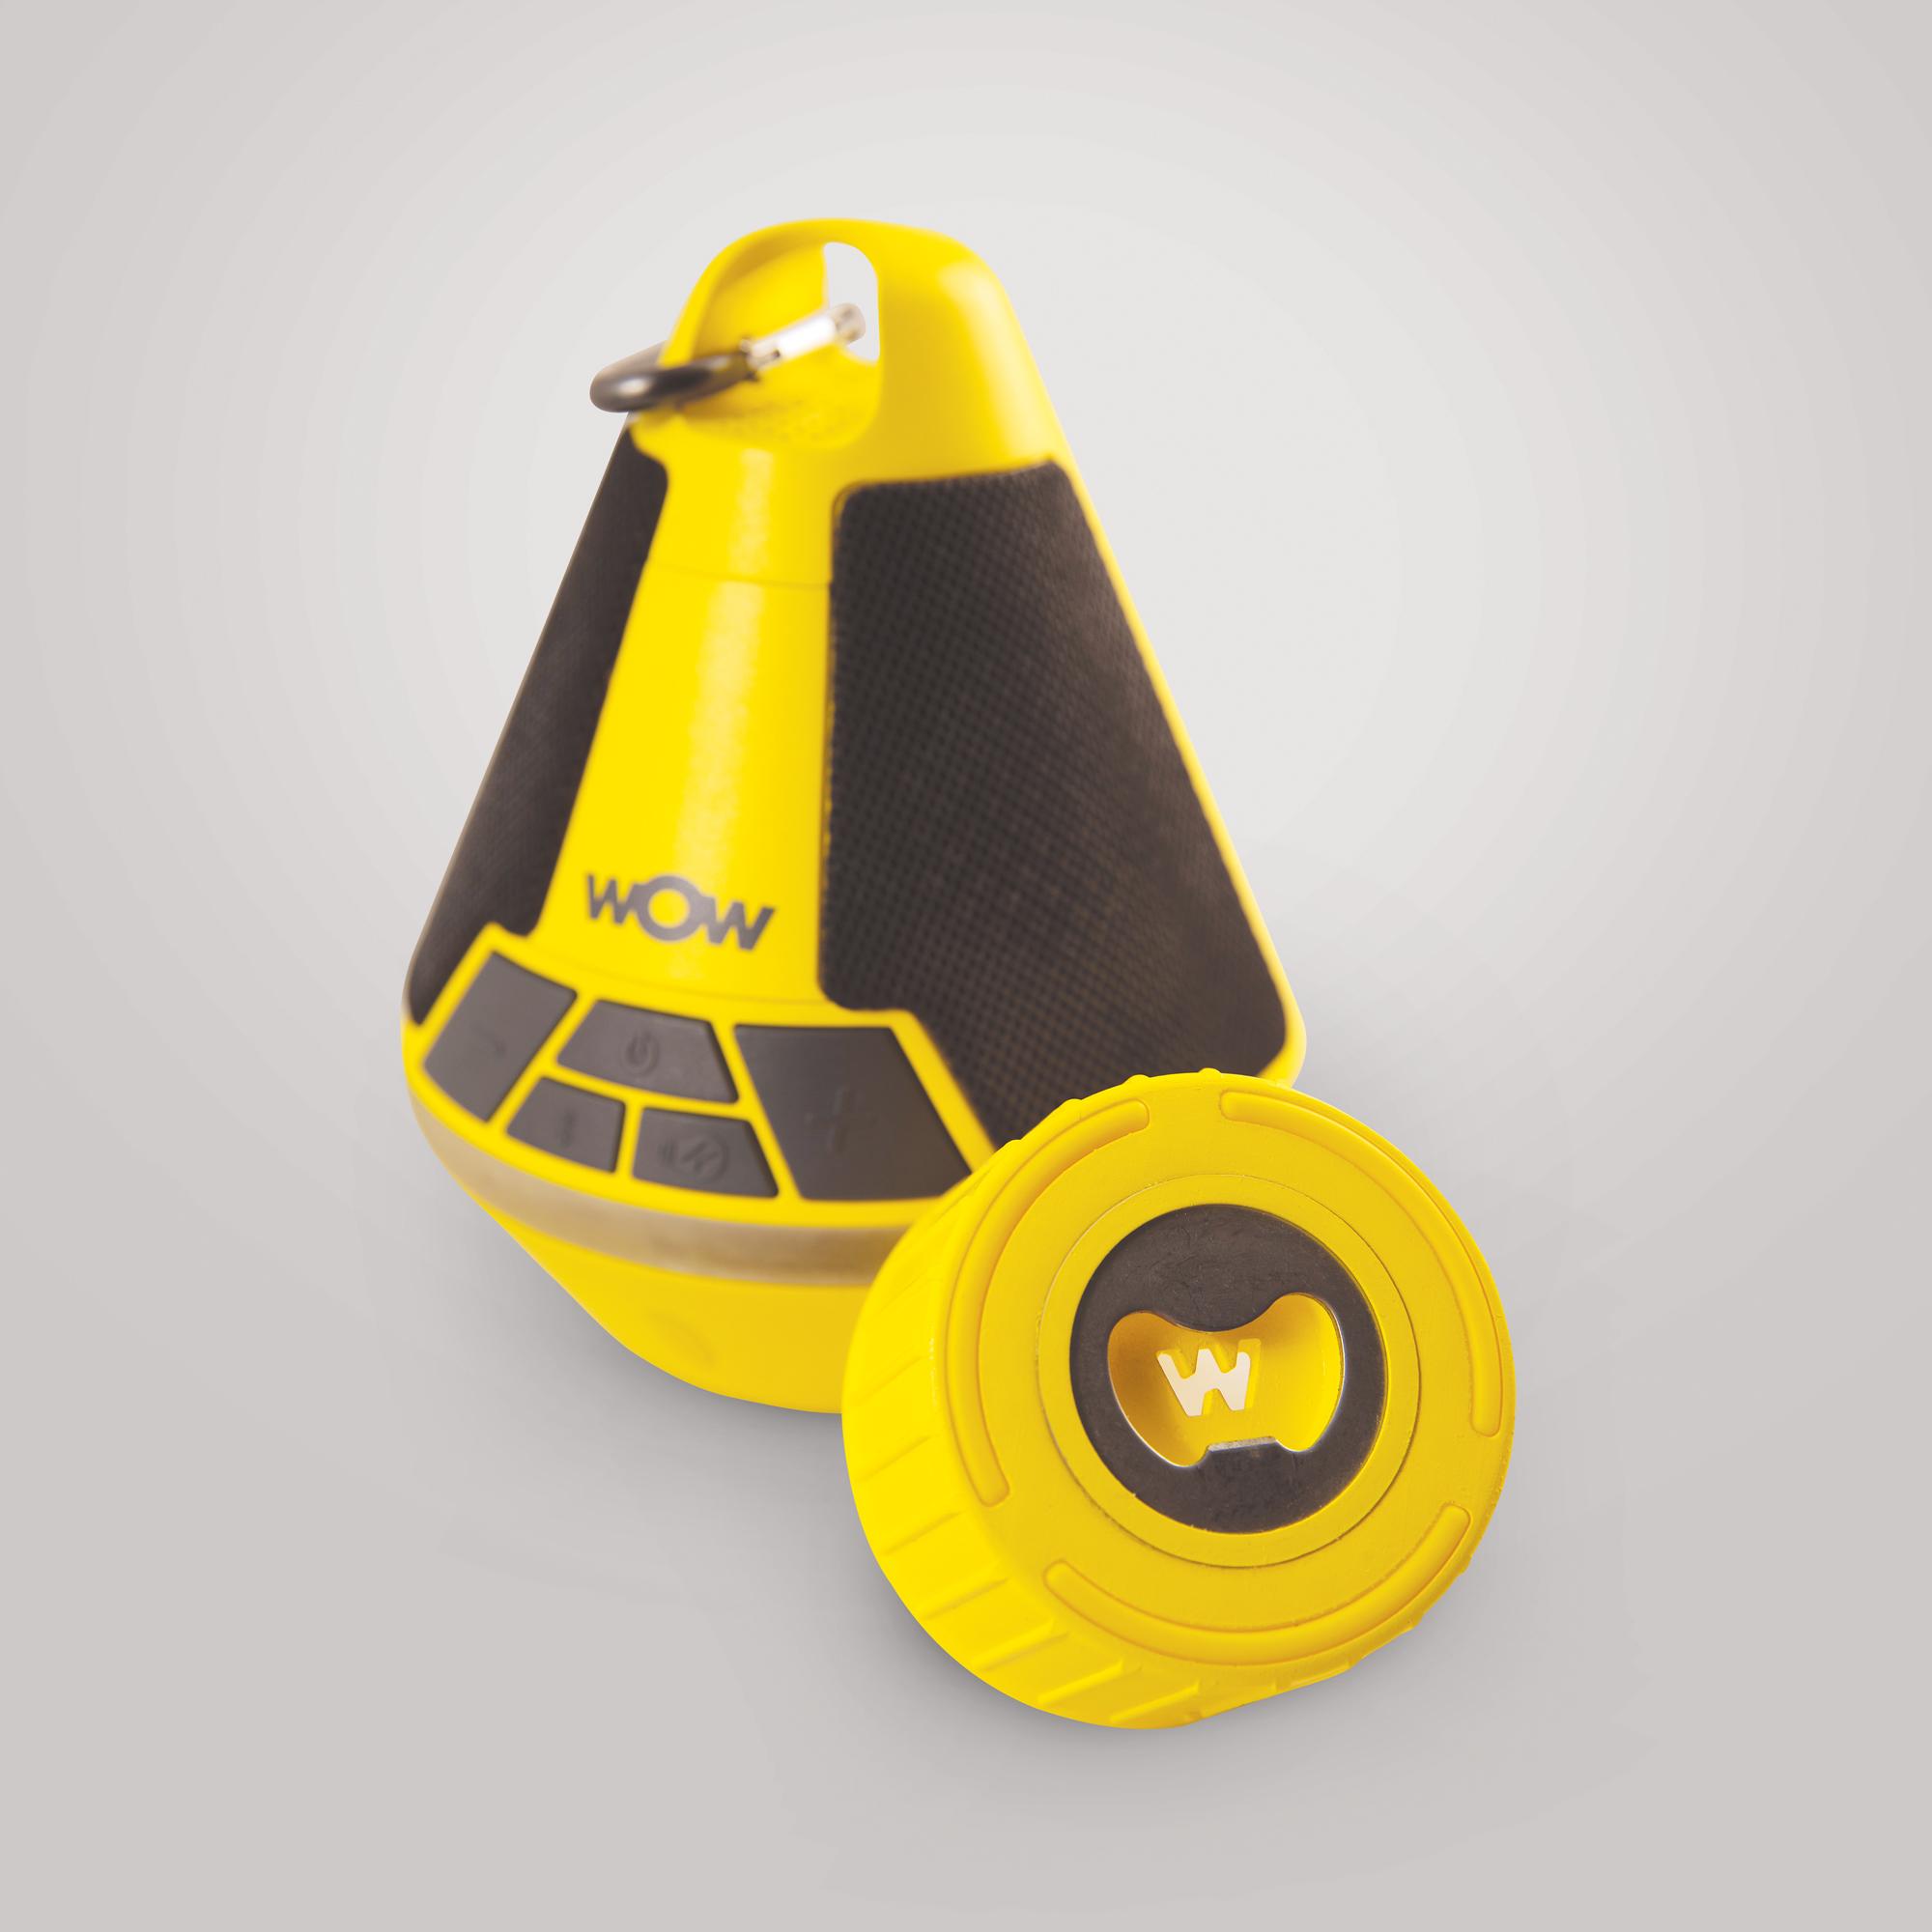 Sound buoy bluetooth speaker